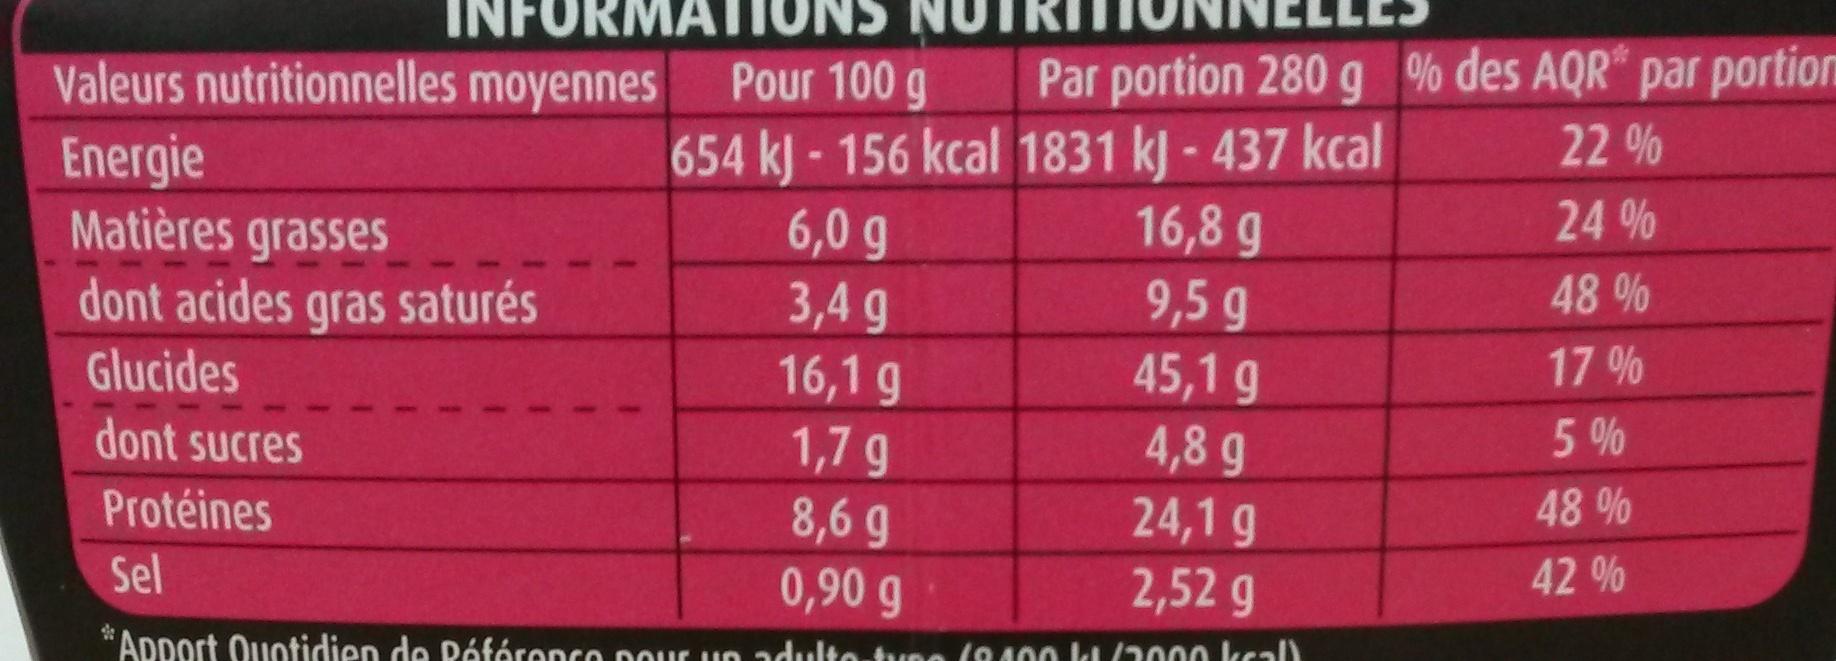 CremioBox - Jambon à la crème - Voedingswaarden